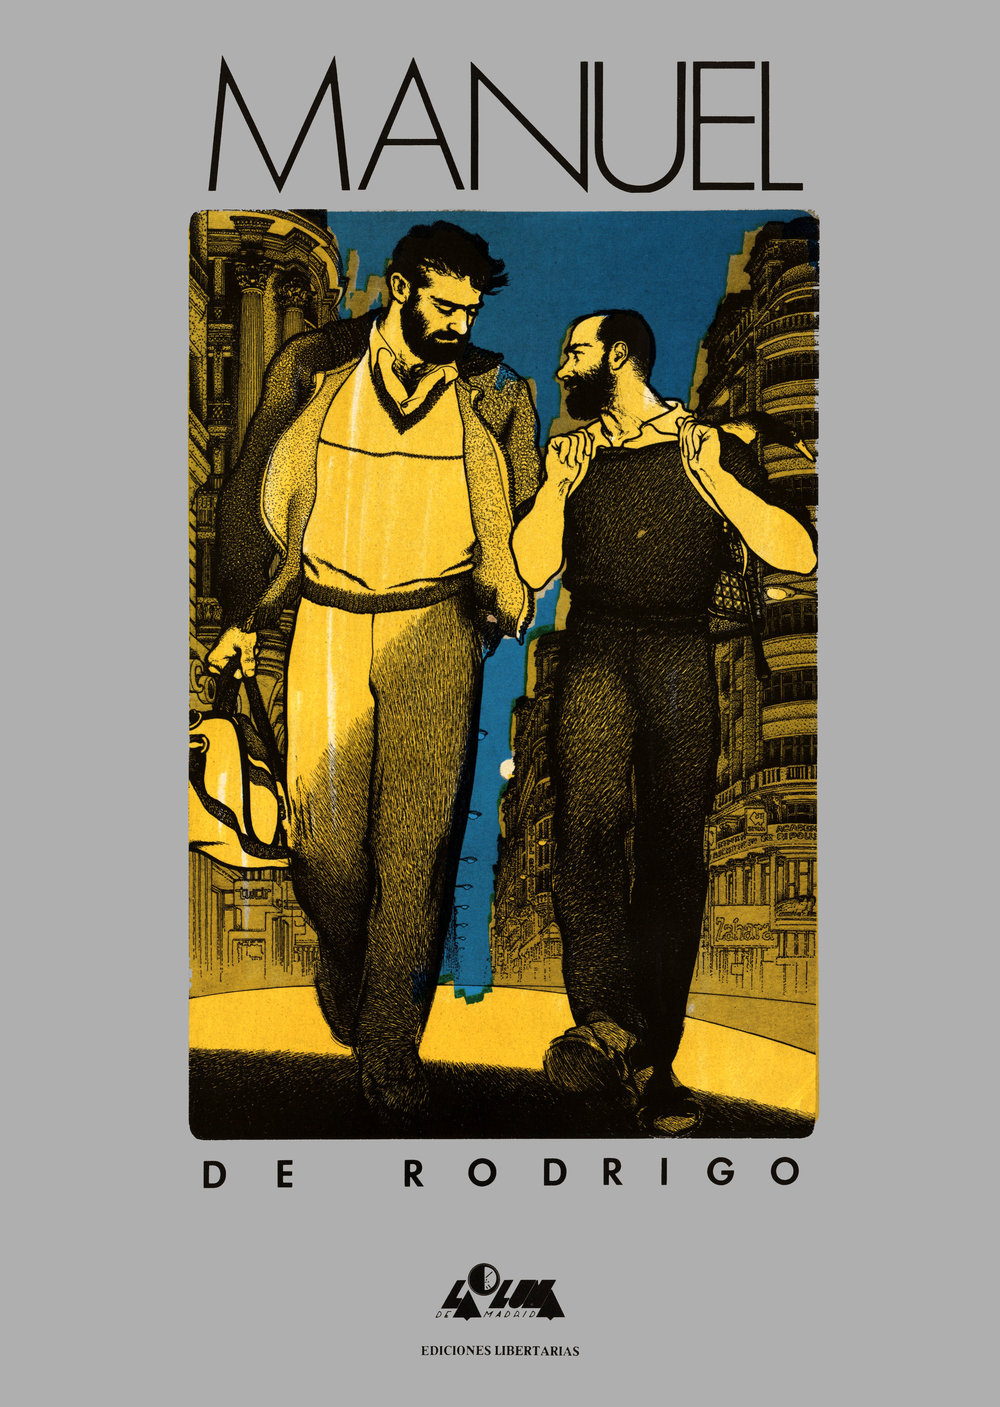 Cover to the original 1985 edition.